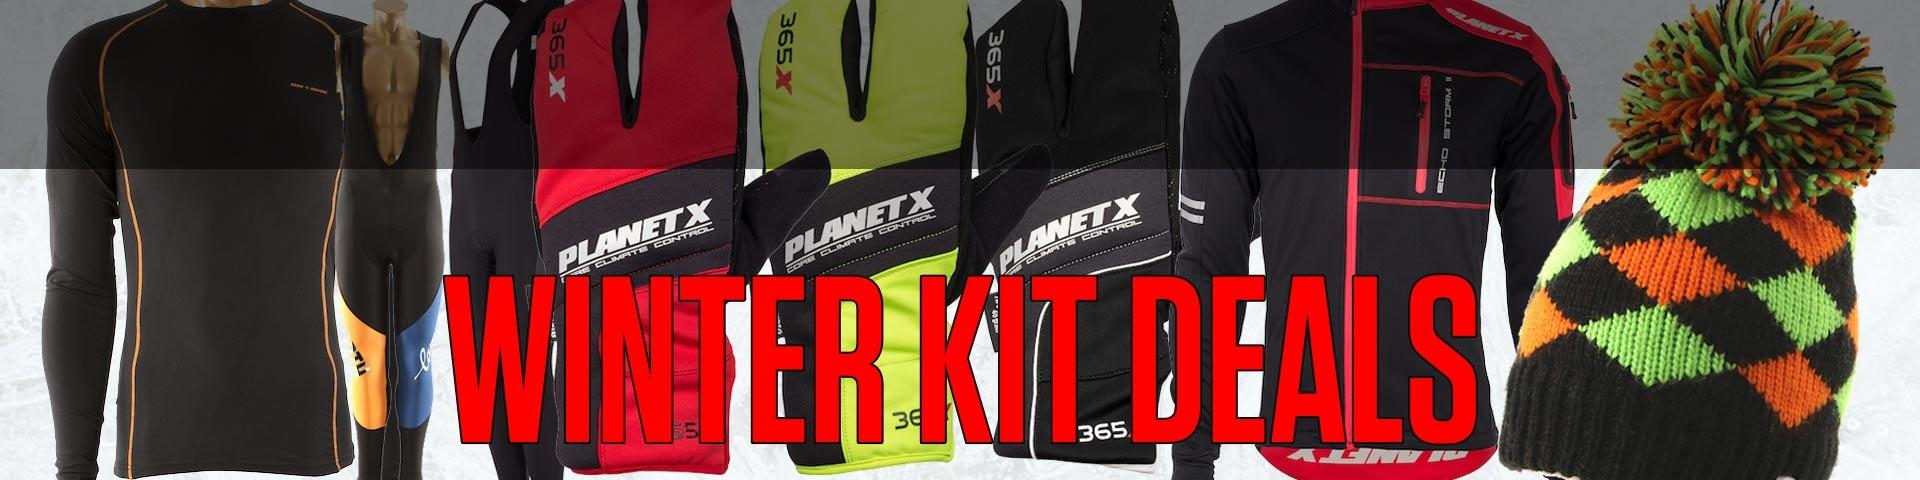 WInter Cycling Kit Deals